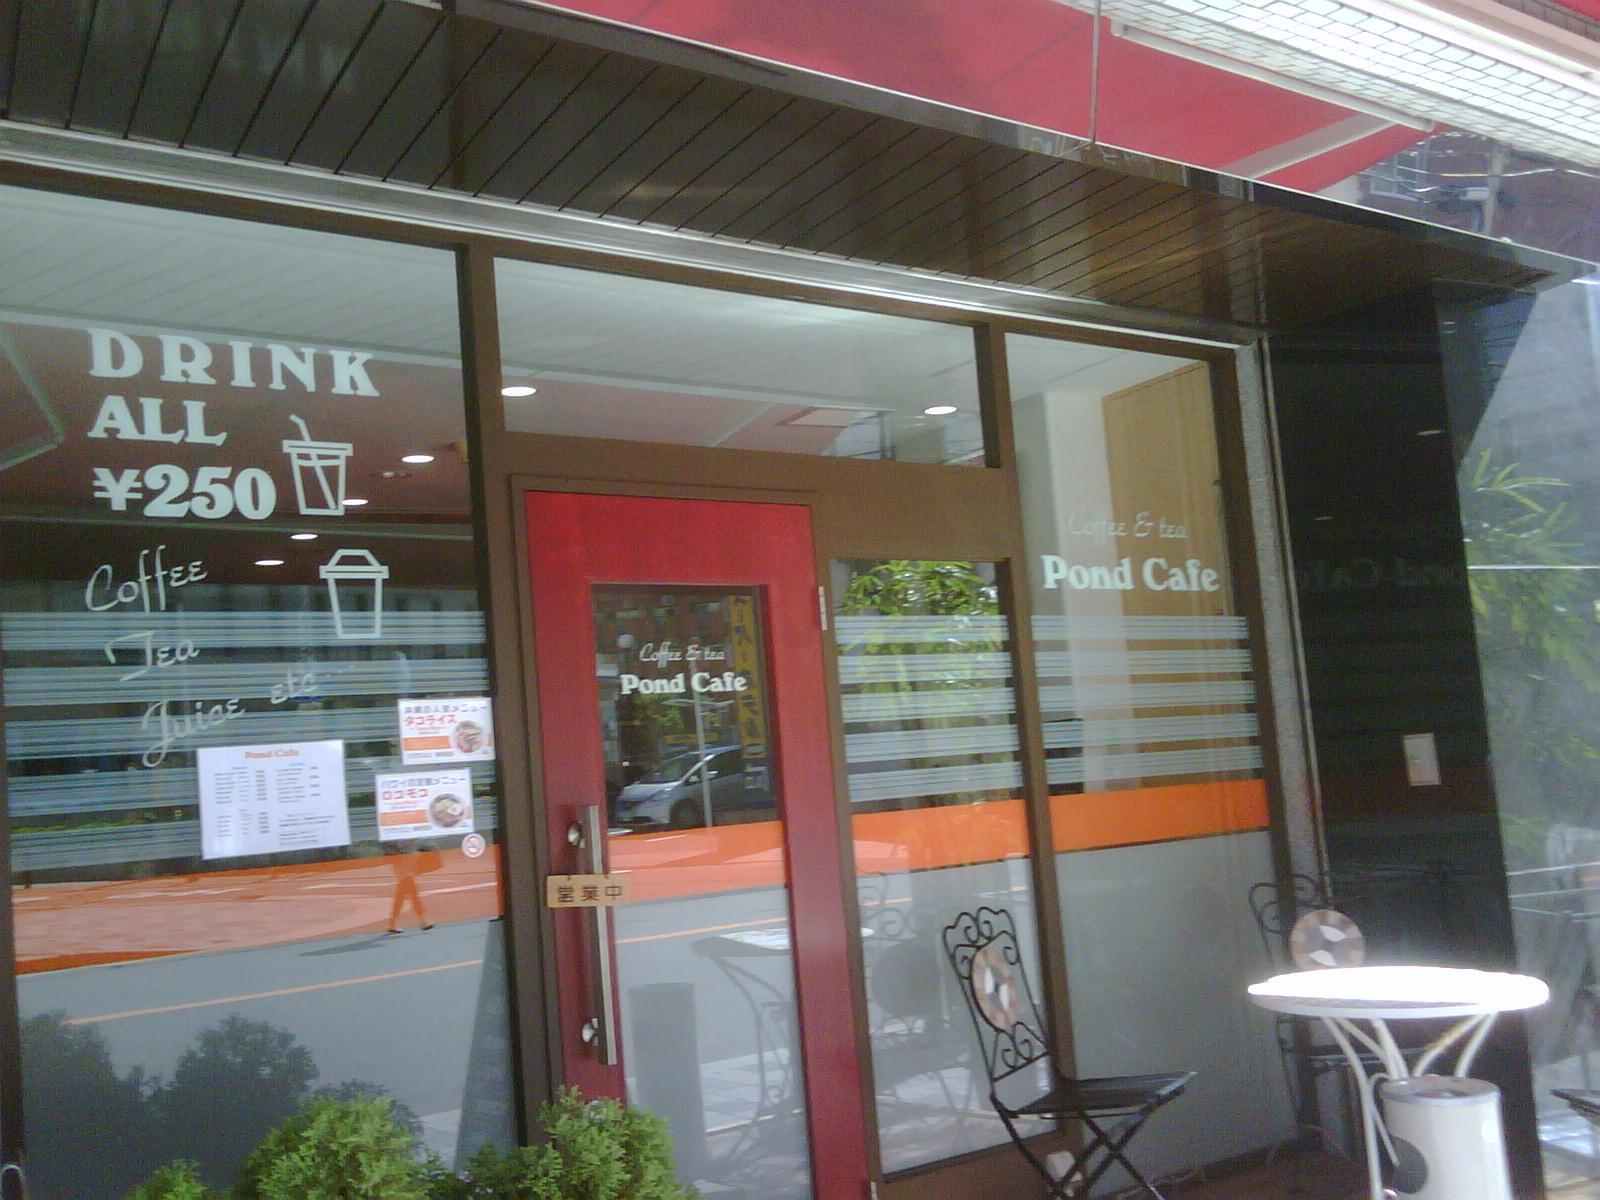 POND CAFE